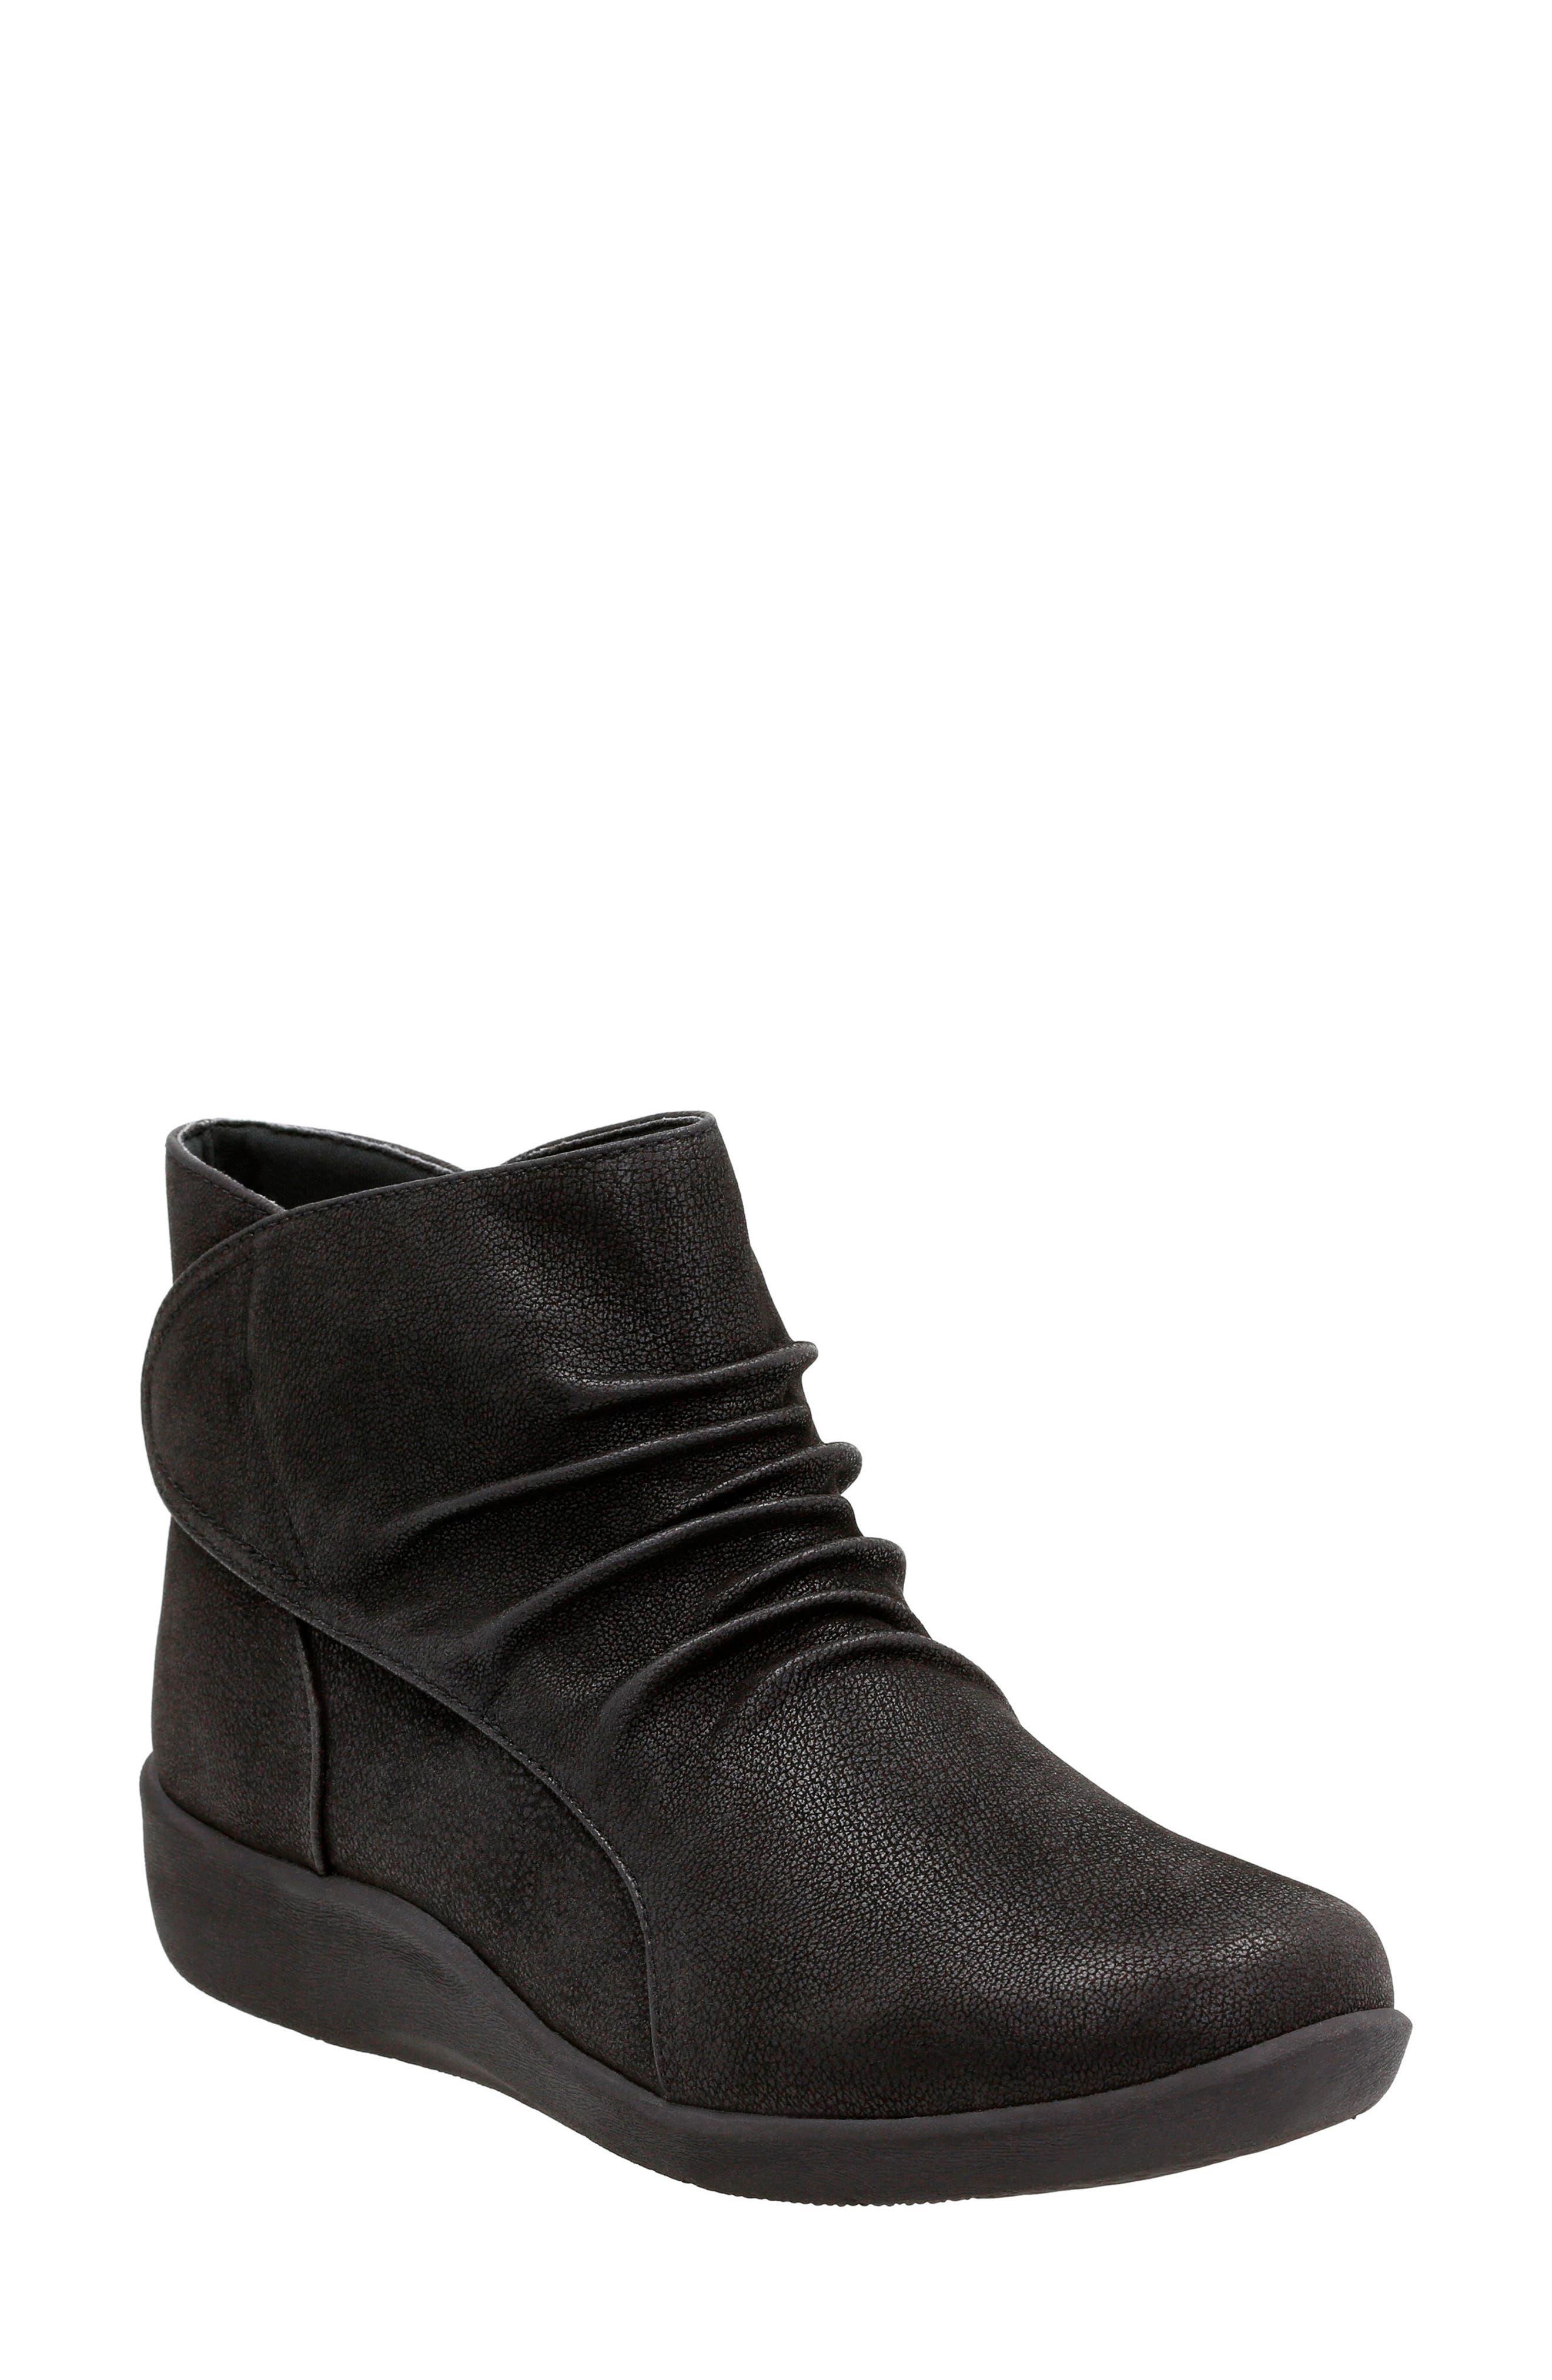 Alternate Image 1 Selected - Clarks® Sillian Sway Boot (Women)